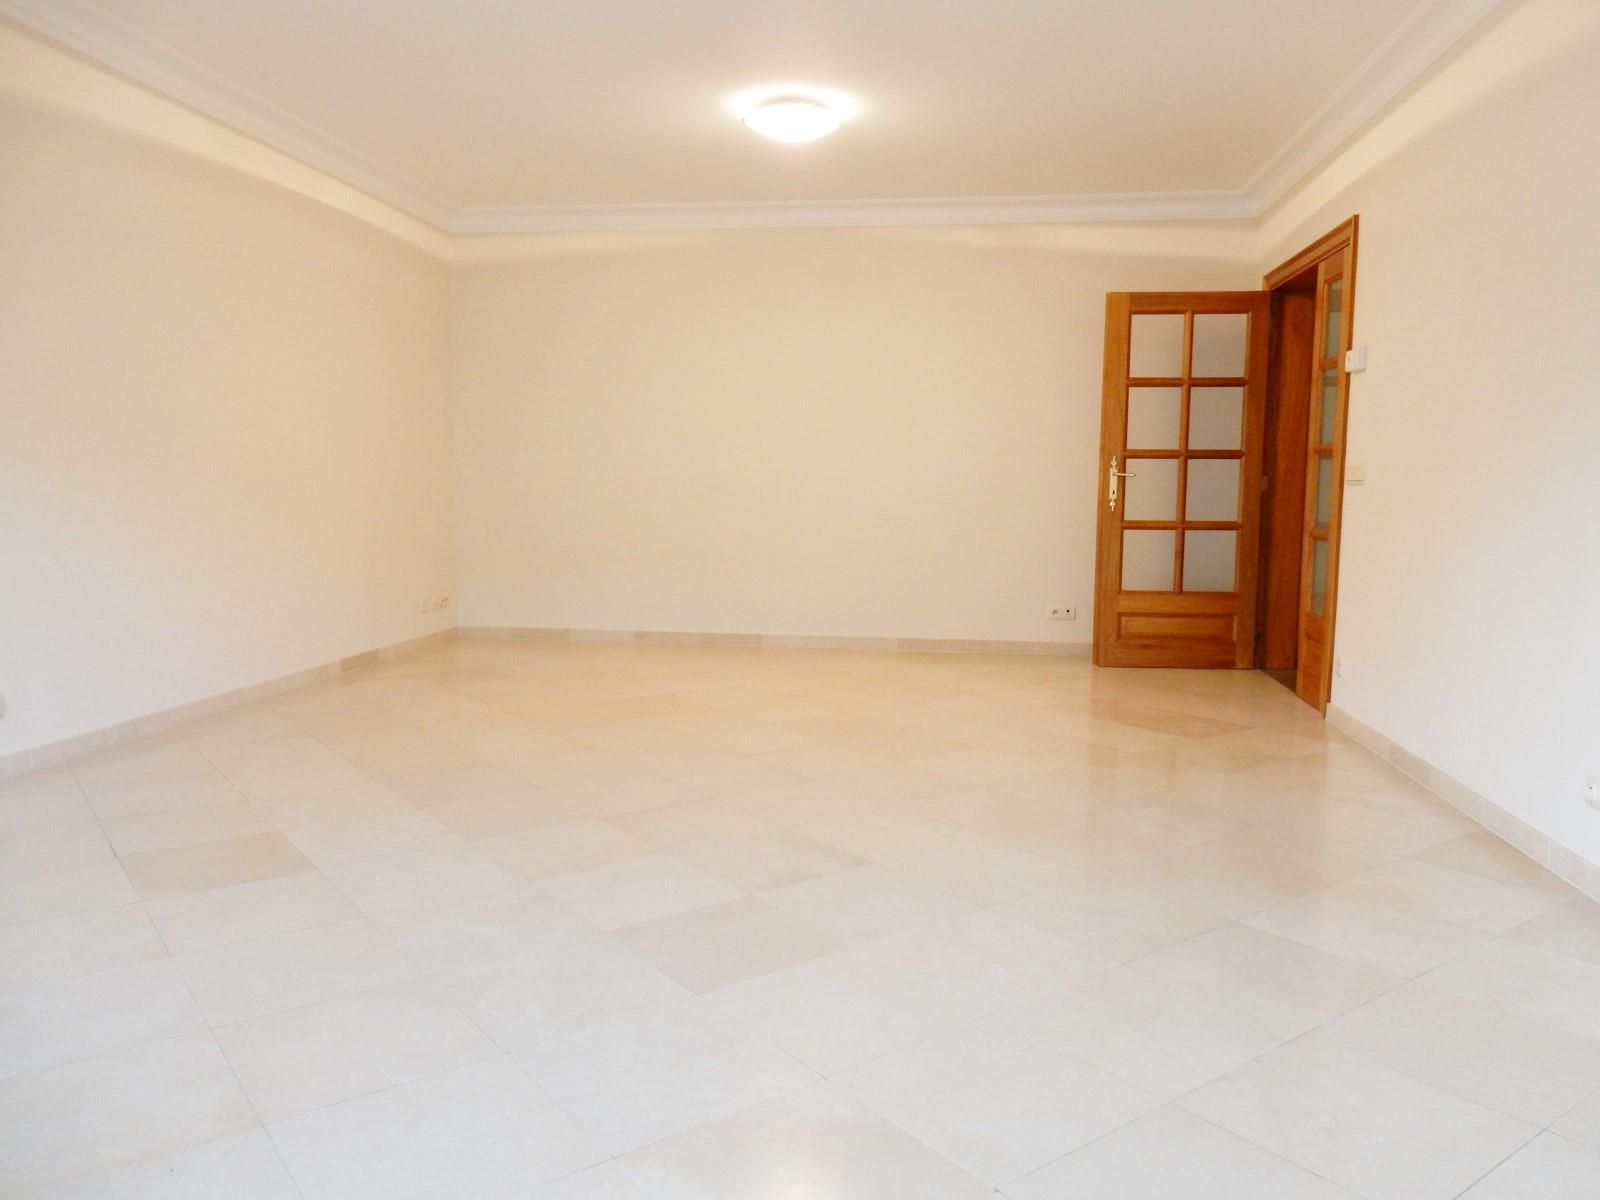 Exceptional apartment  - Woluwe-Saint-Pierre - #3116510-25